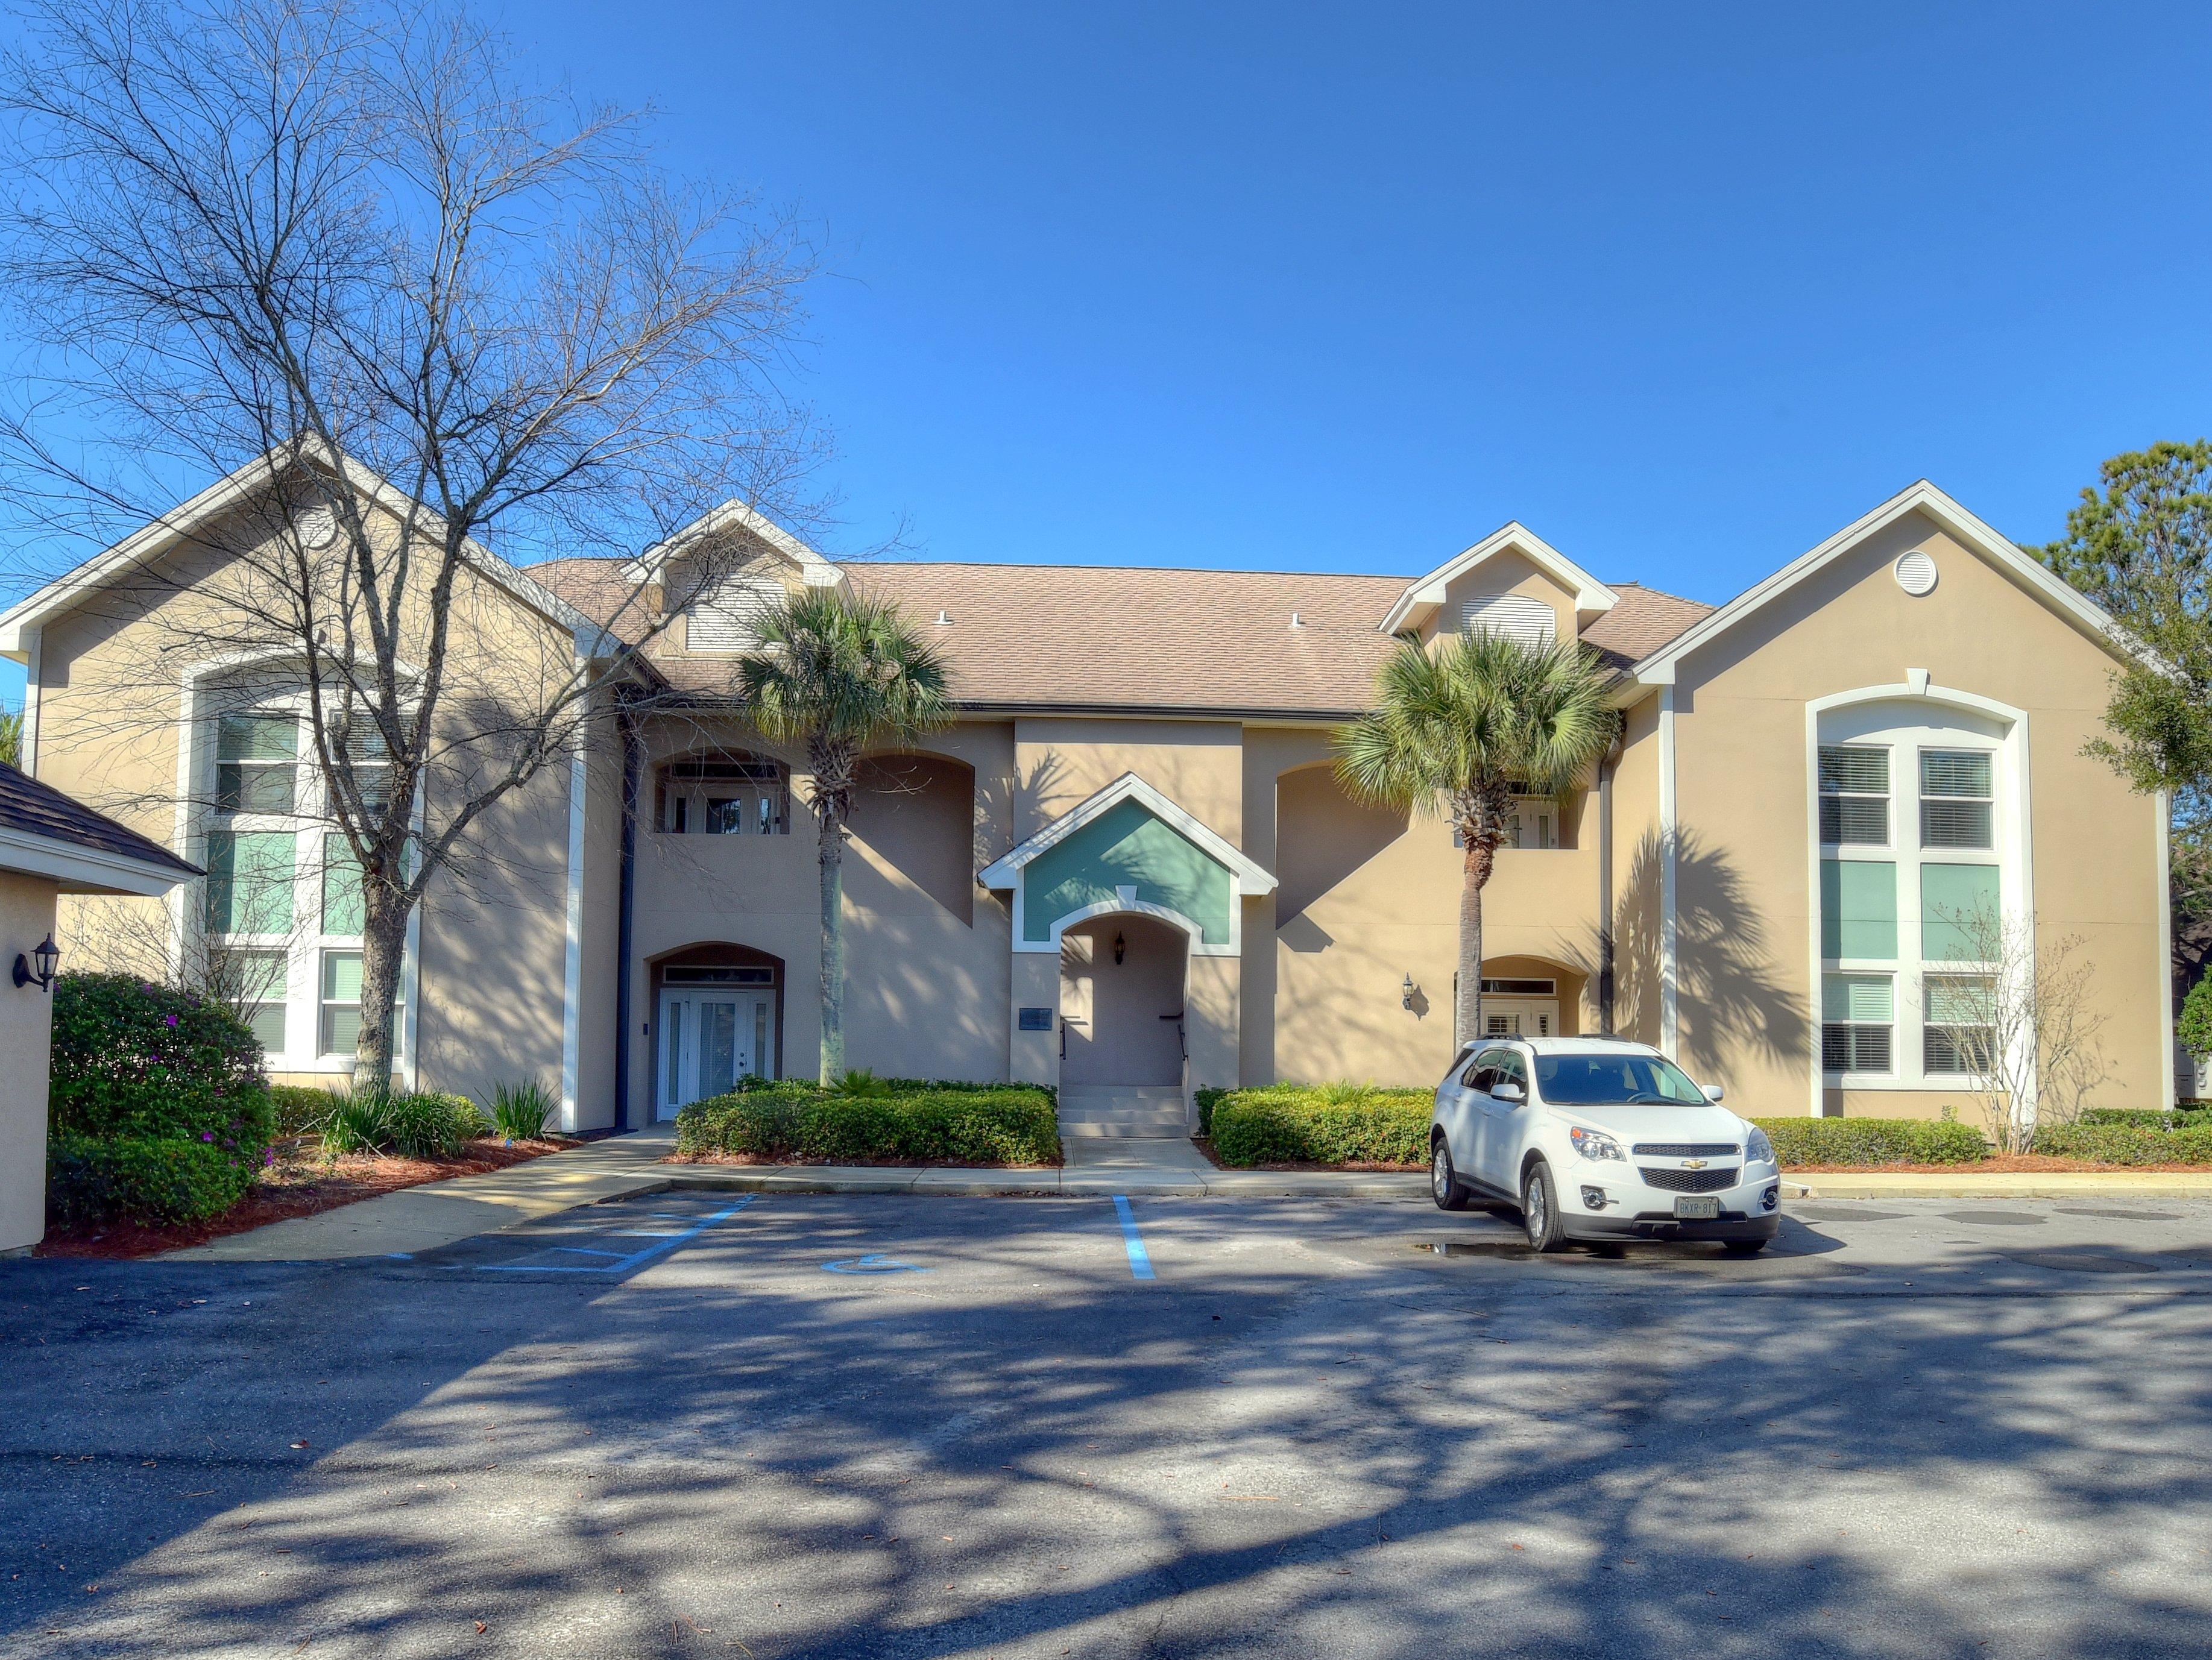 8511 Turnberry Condo rental in Sandestin Rentals ~ Cottages and Villas  in Destin Florida - #28